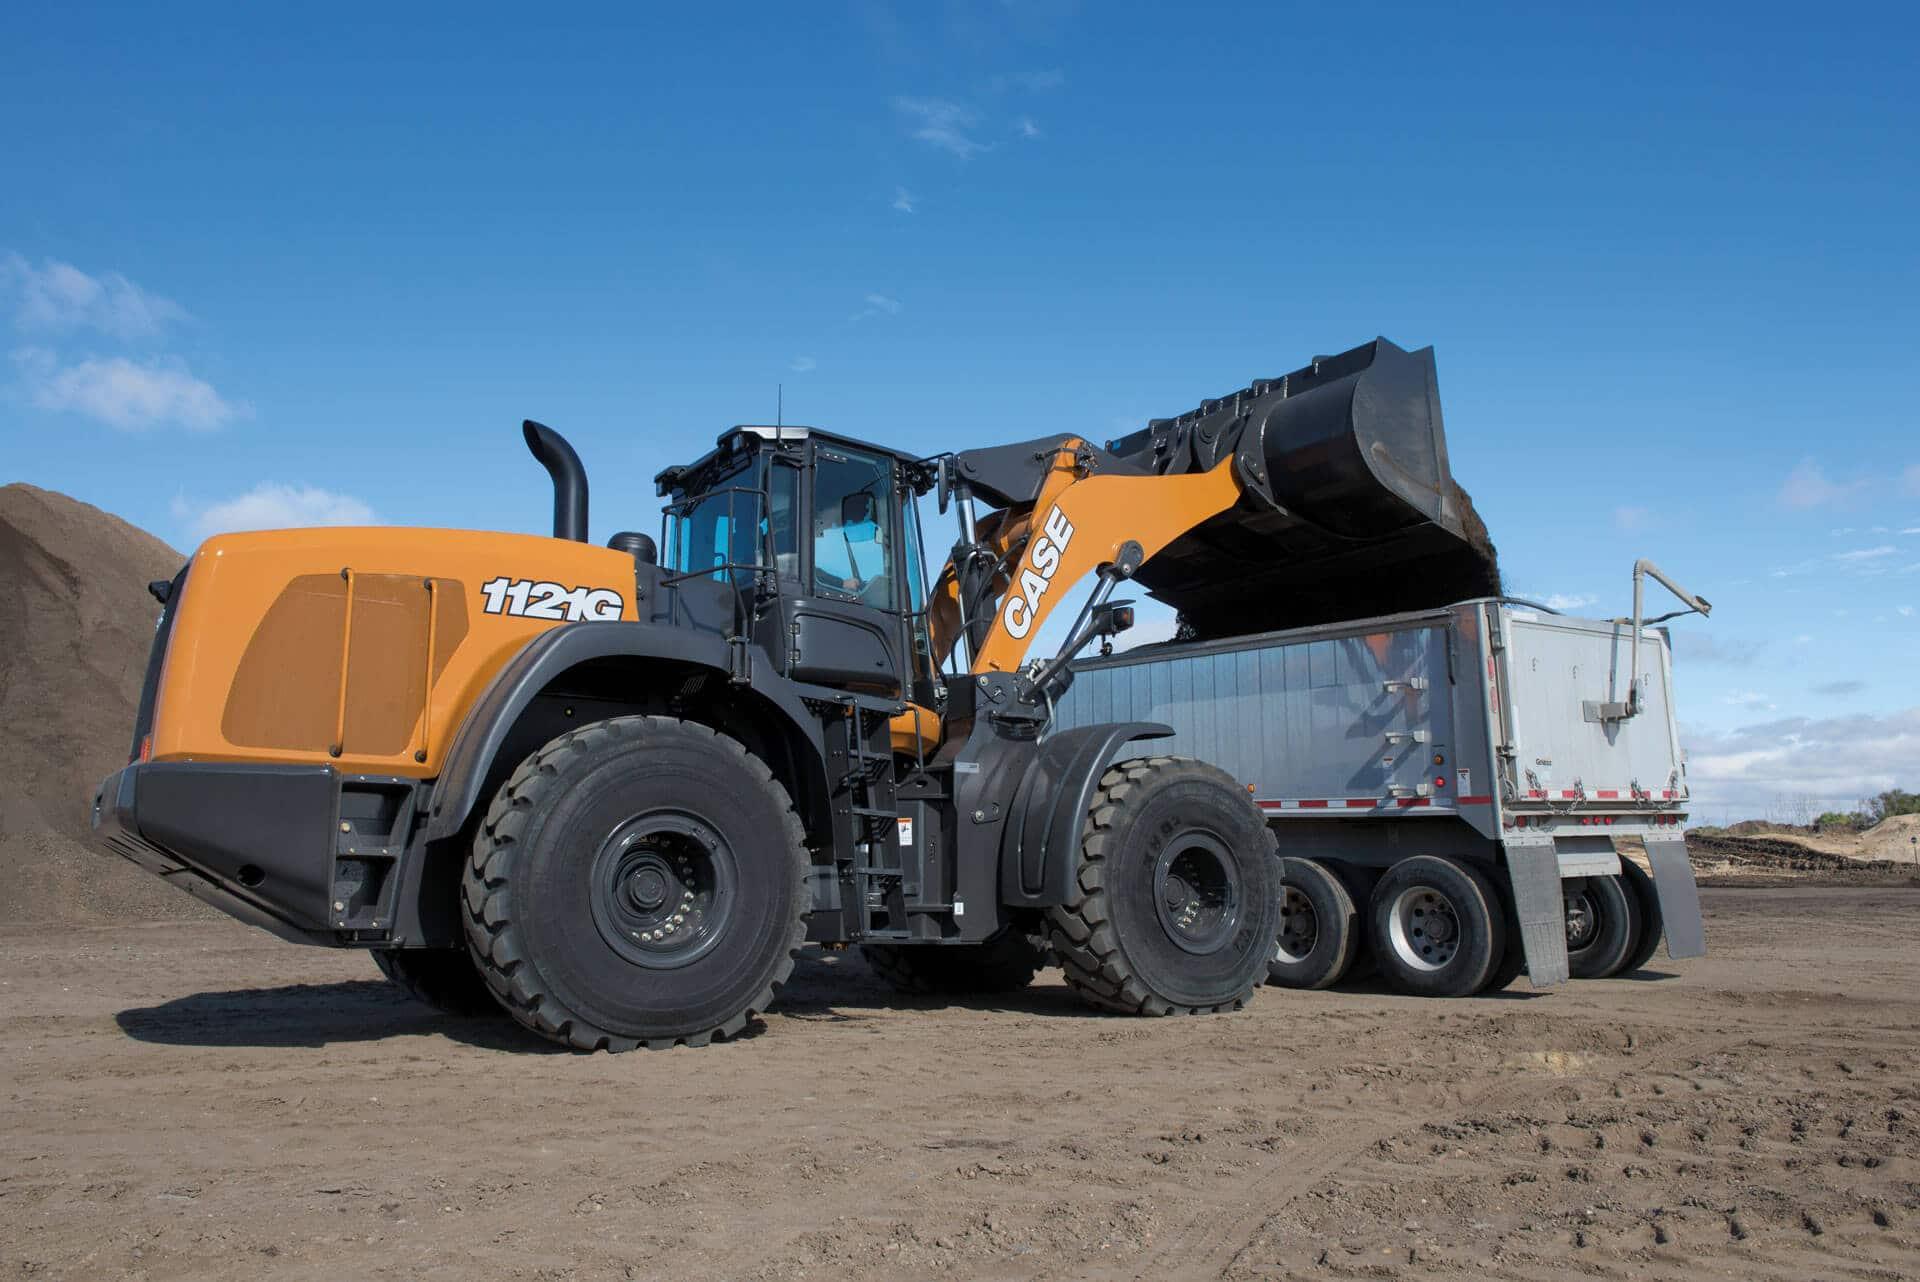 Case 586g Fork Lift Control Levers : Case g wheel loader construction equipment